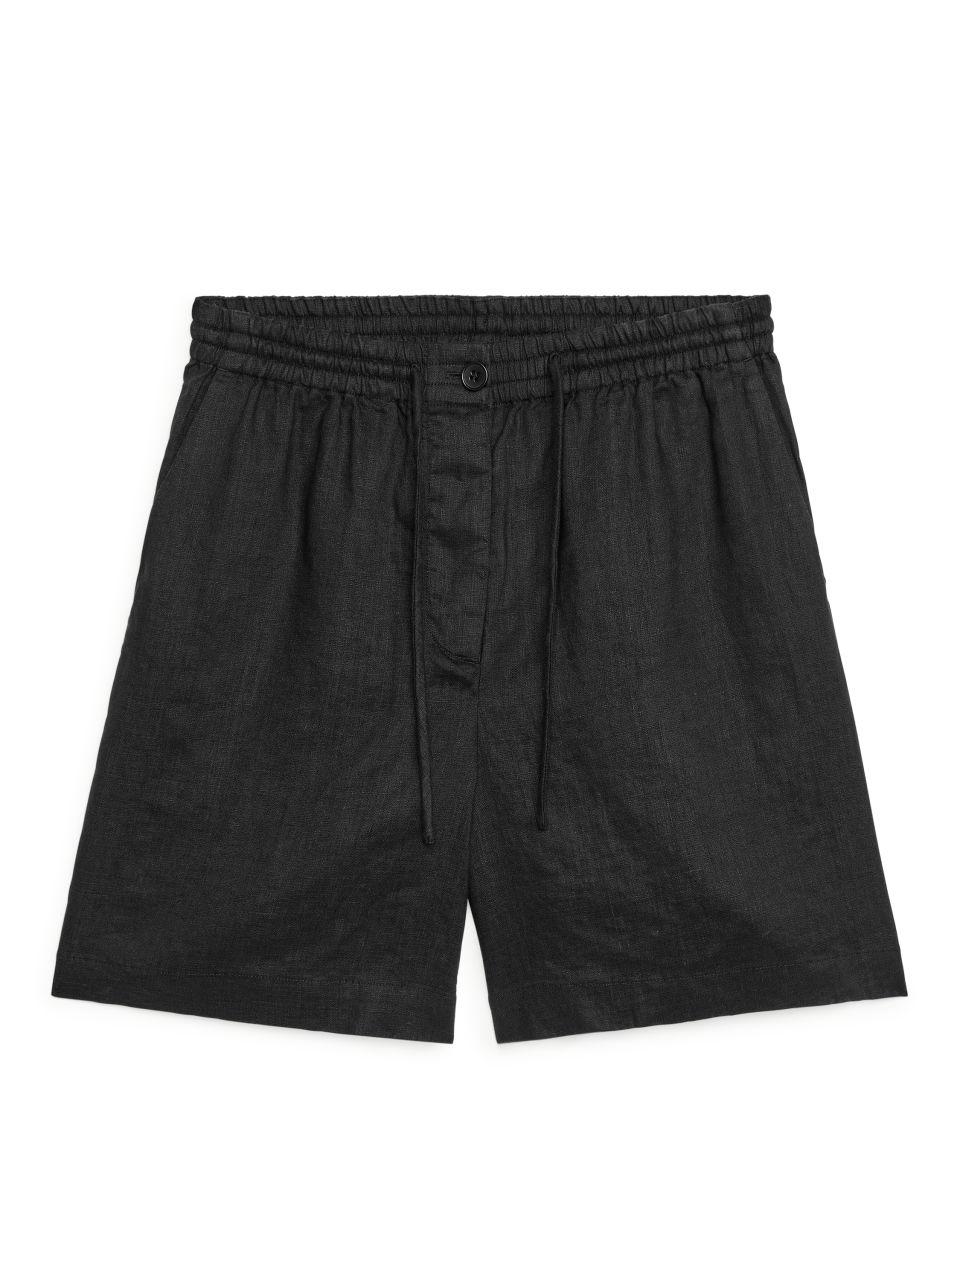 Linen Drawstring Shorts - Black